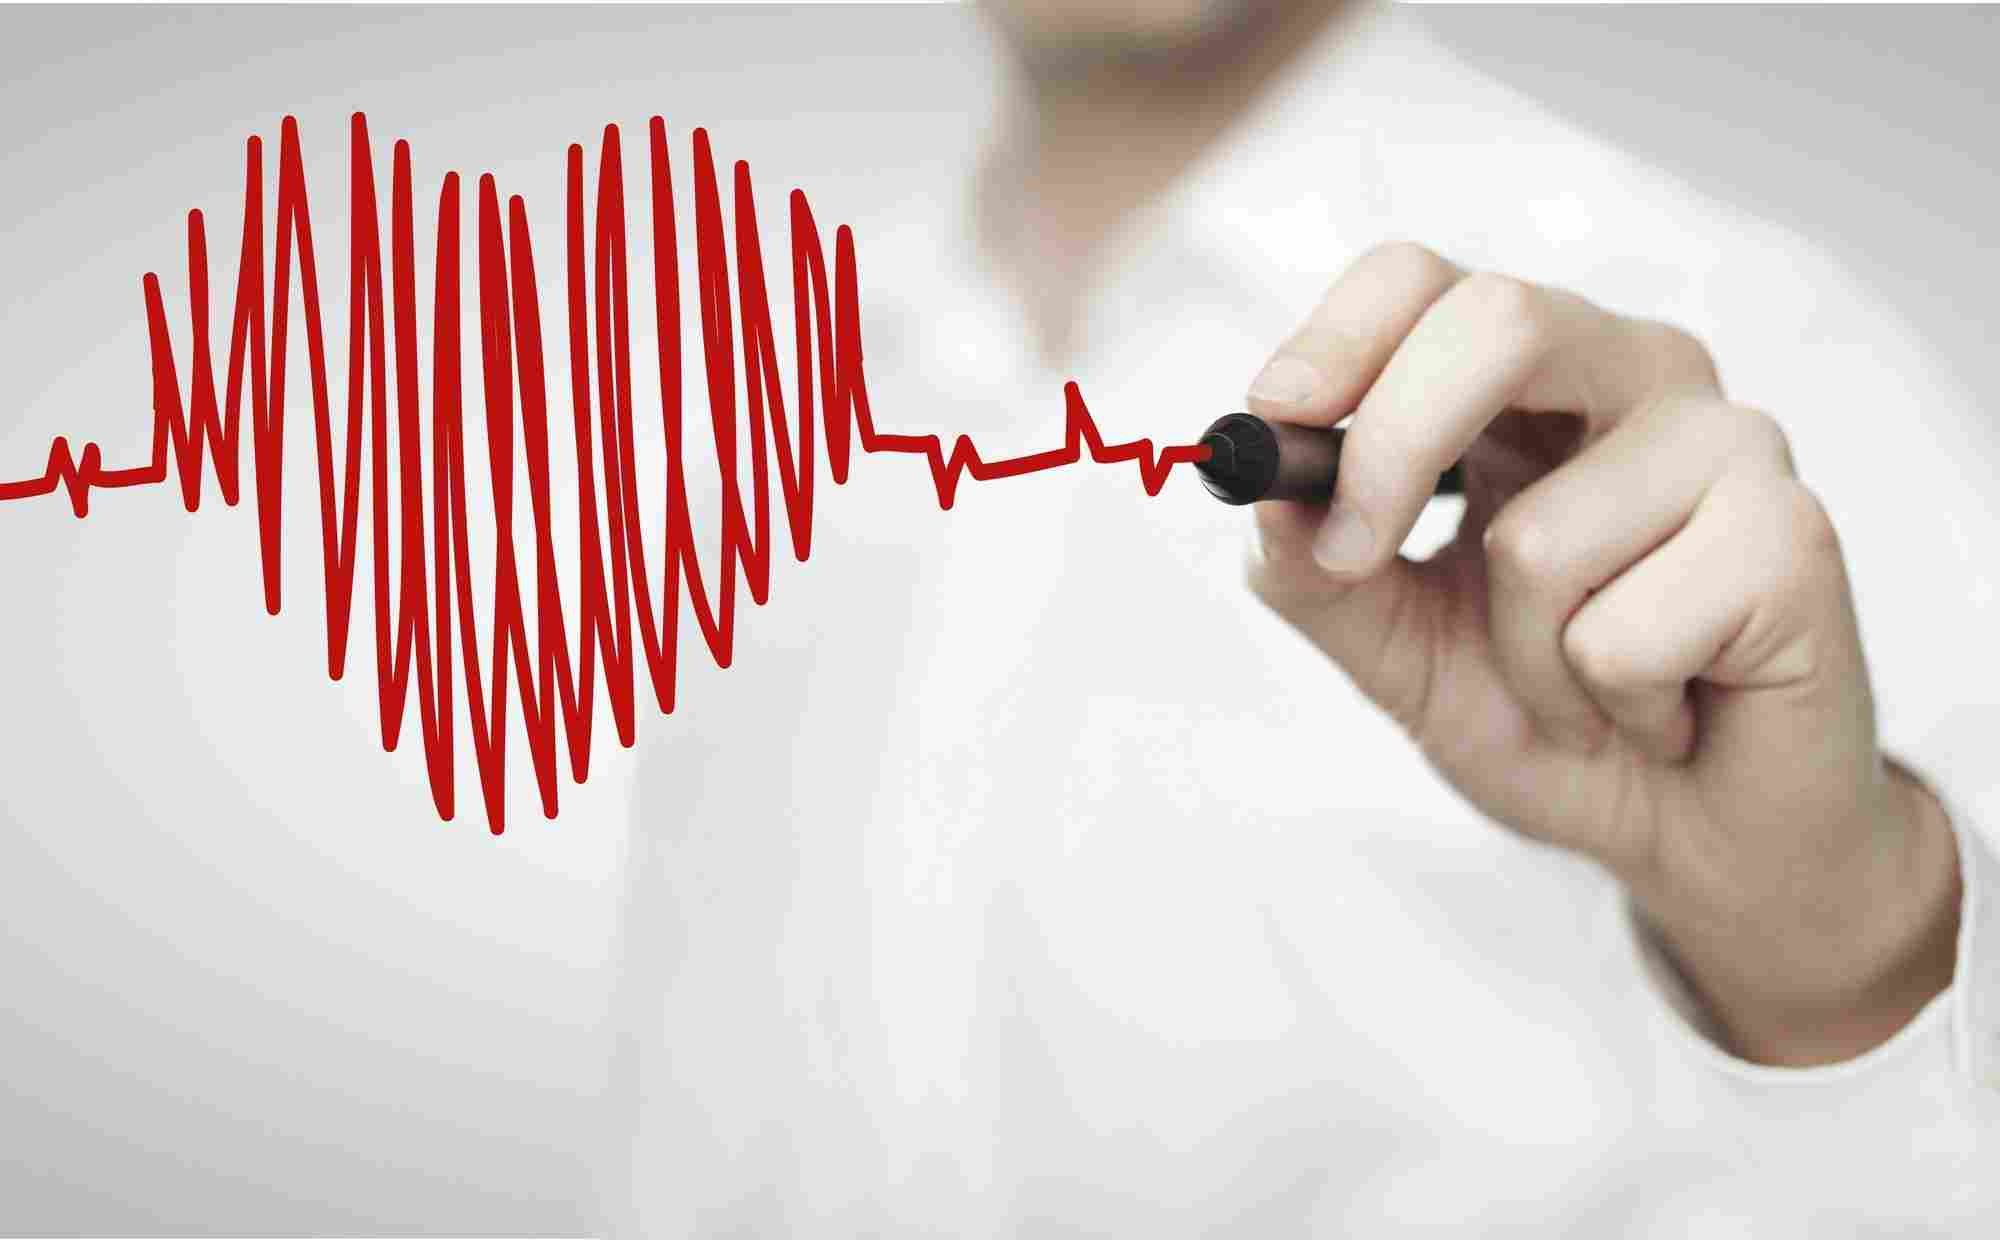 http://medquimheo.com.br/wp-content/uploads/2015/12/heart-health-1.jpg